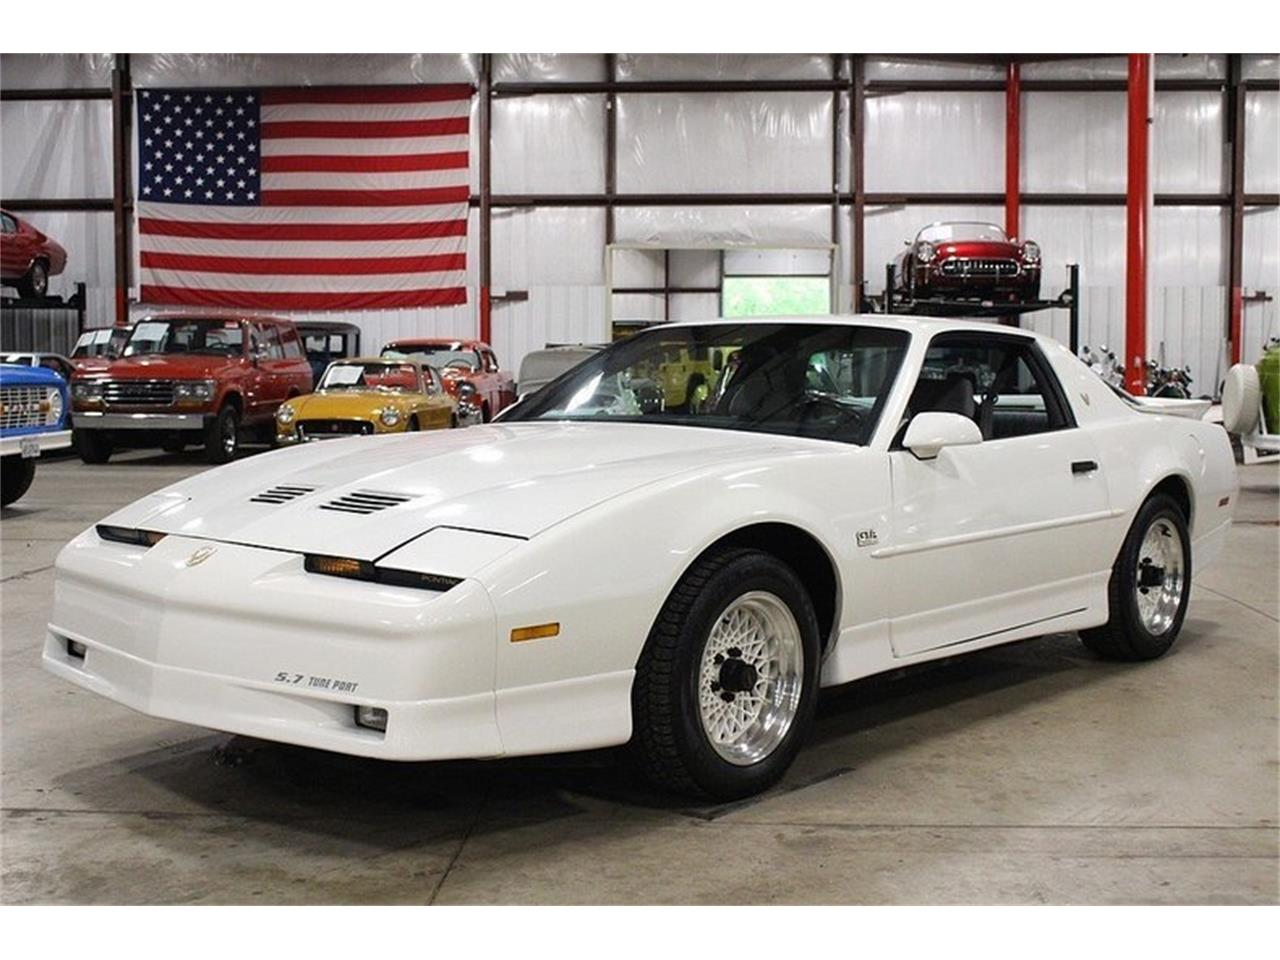 1988 Pontiac Firebird Trans Am Gta For Sale Cc Large Picture Of 88 Nhc9